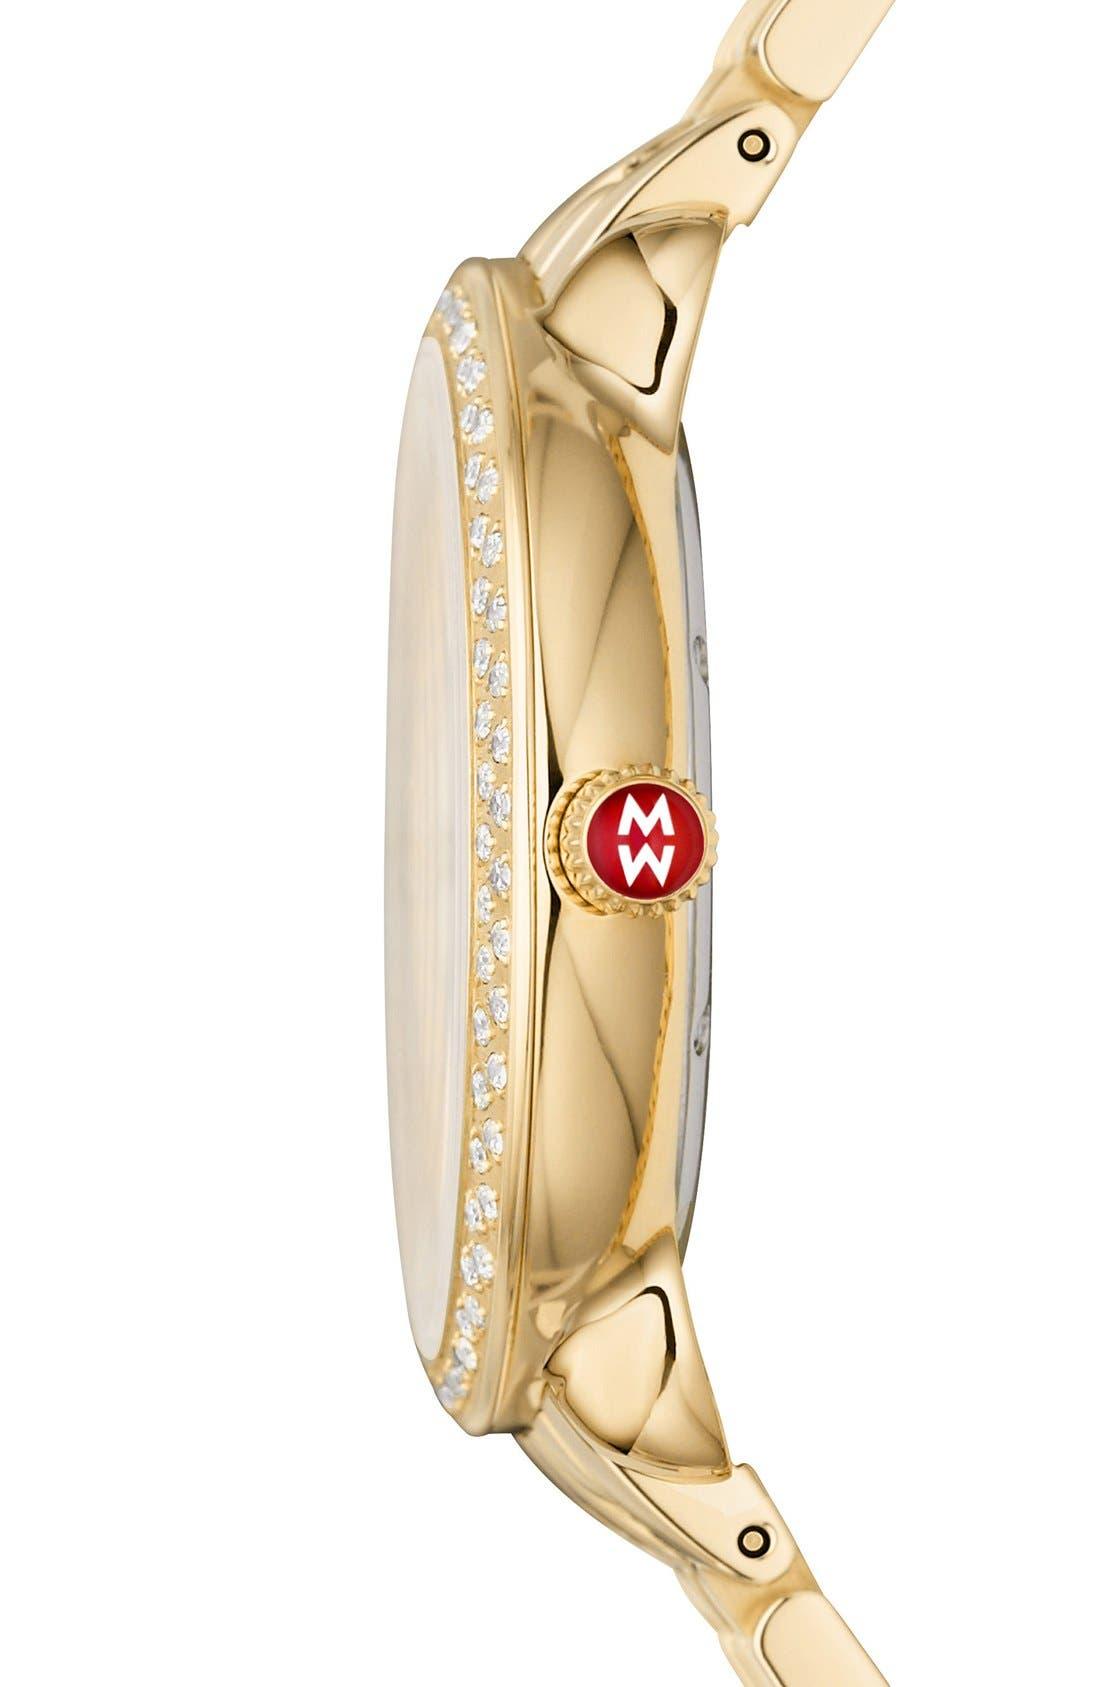 Serein 16mm Gold Plated Bracelet Watchband,                             Alternate thumbnail 7, color,                             GOLD